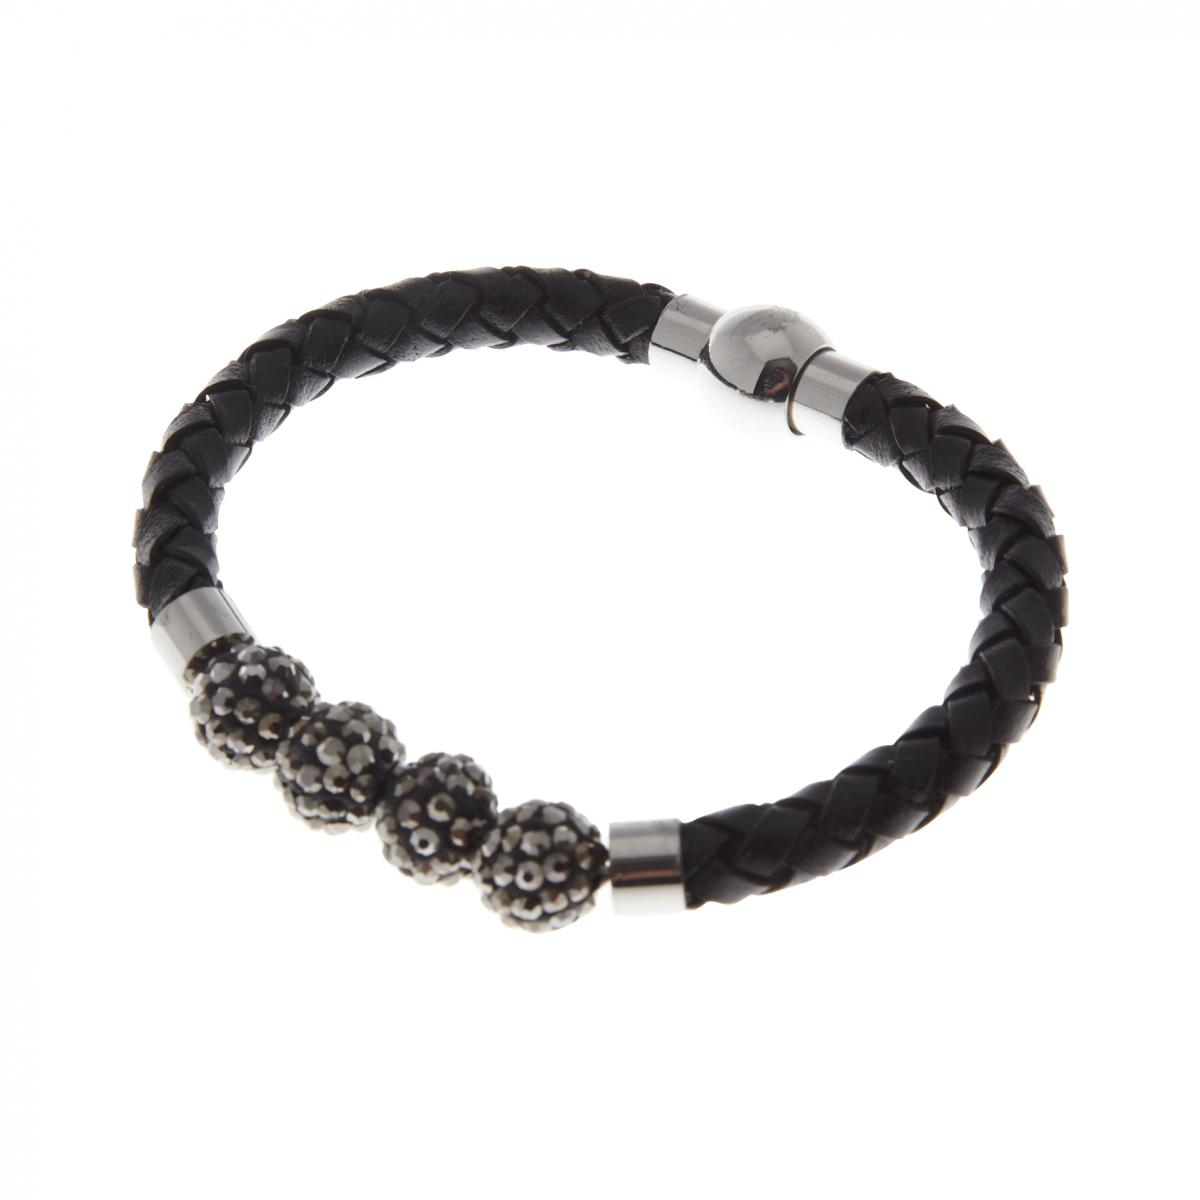 LFC Leather and Diamante Bracelet, £15 http://store.liverpoolfc.com/ladies-leather-brclt-diamonte/